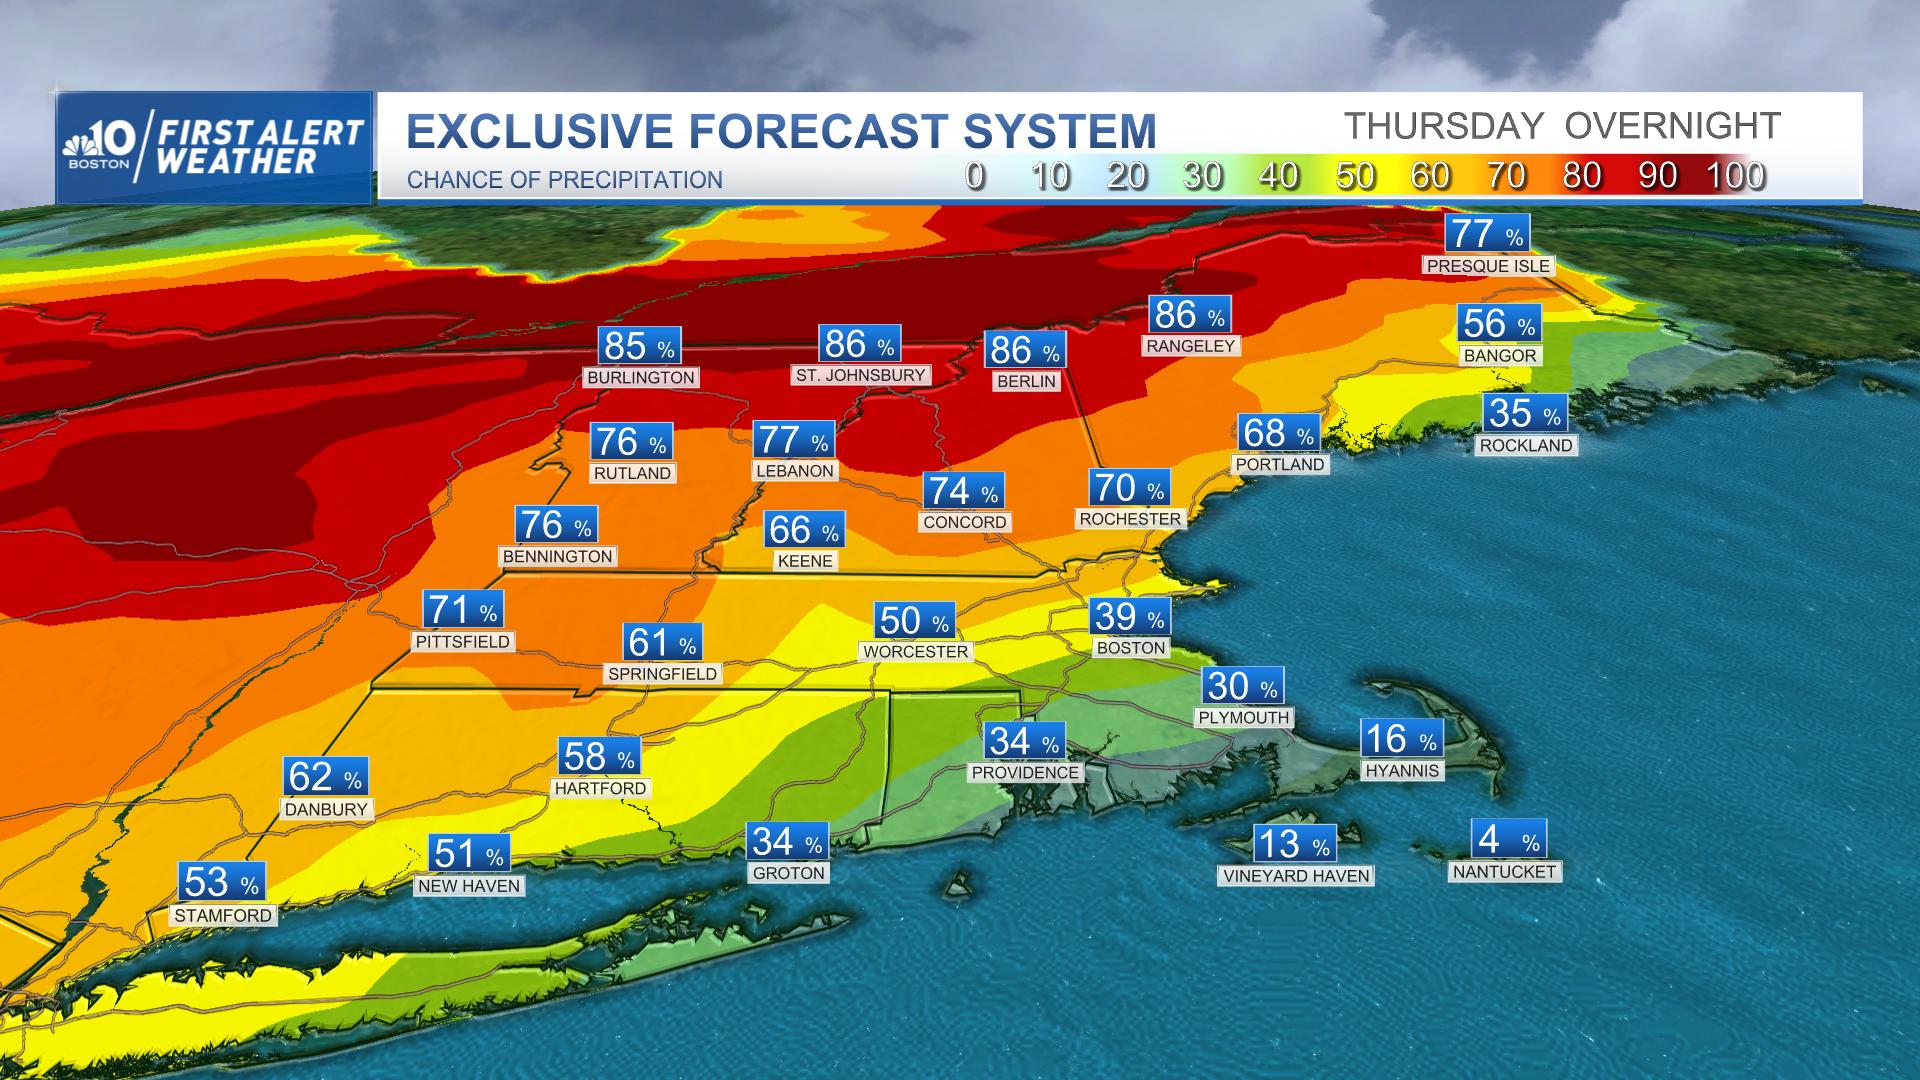 Tonight's Chance of Precipitation